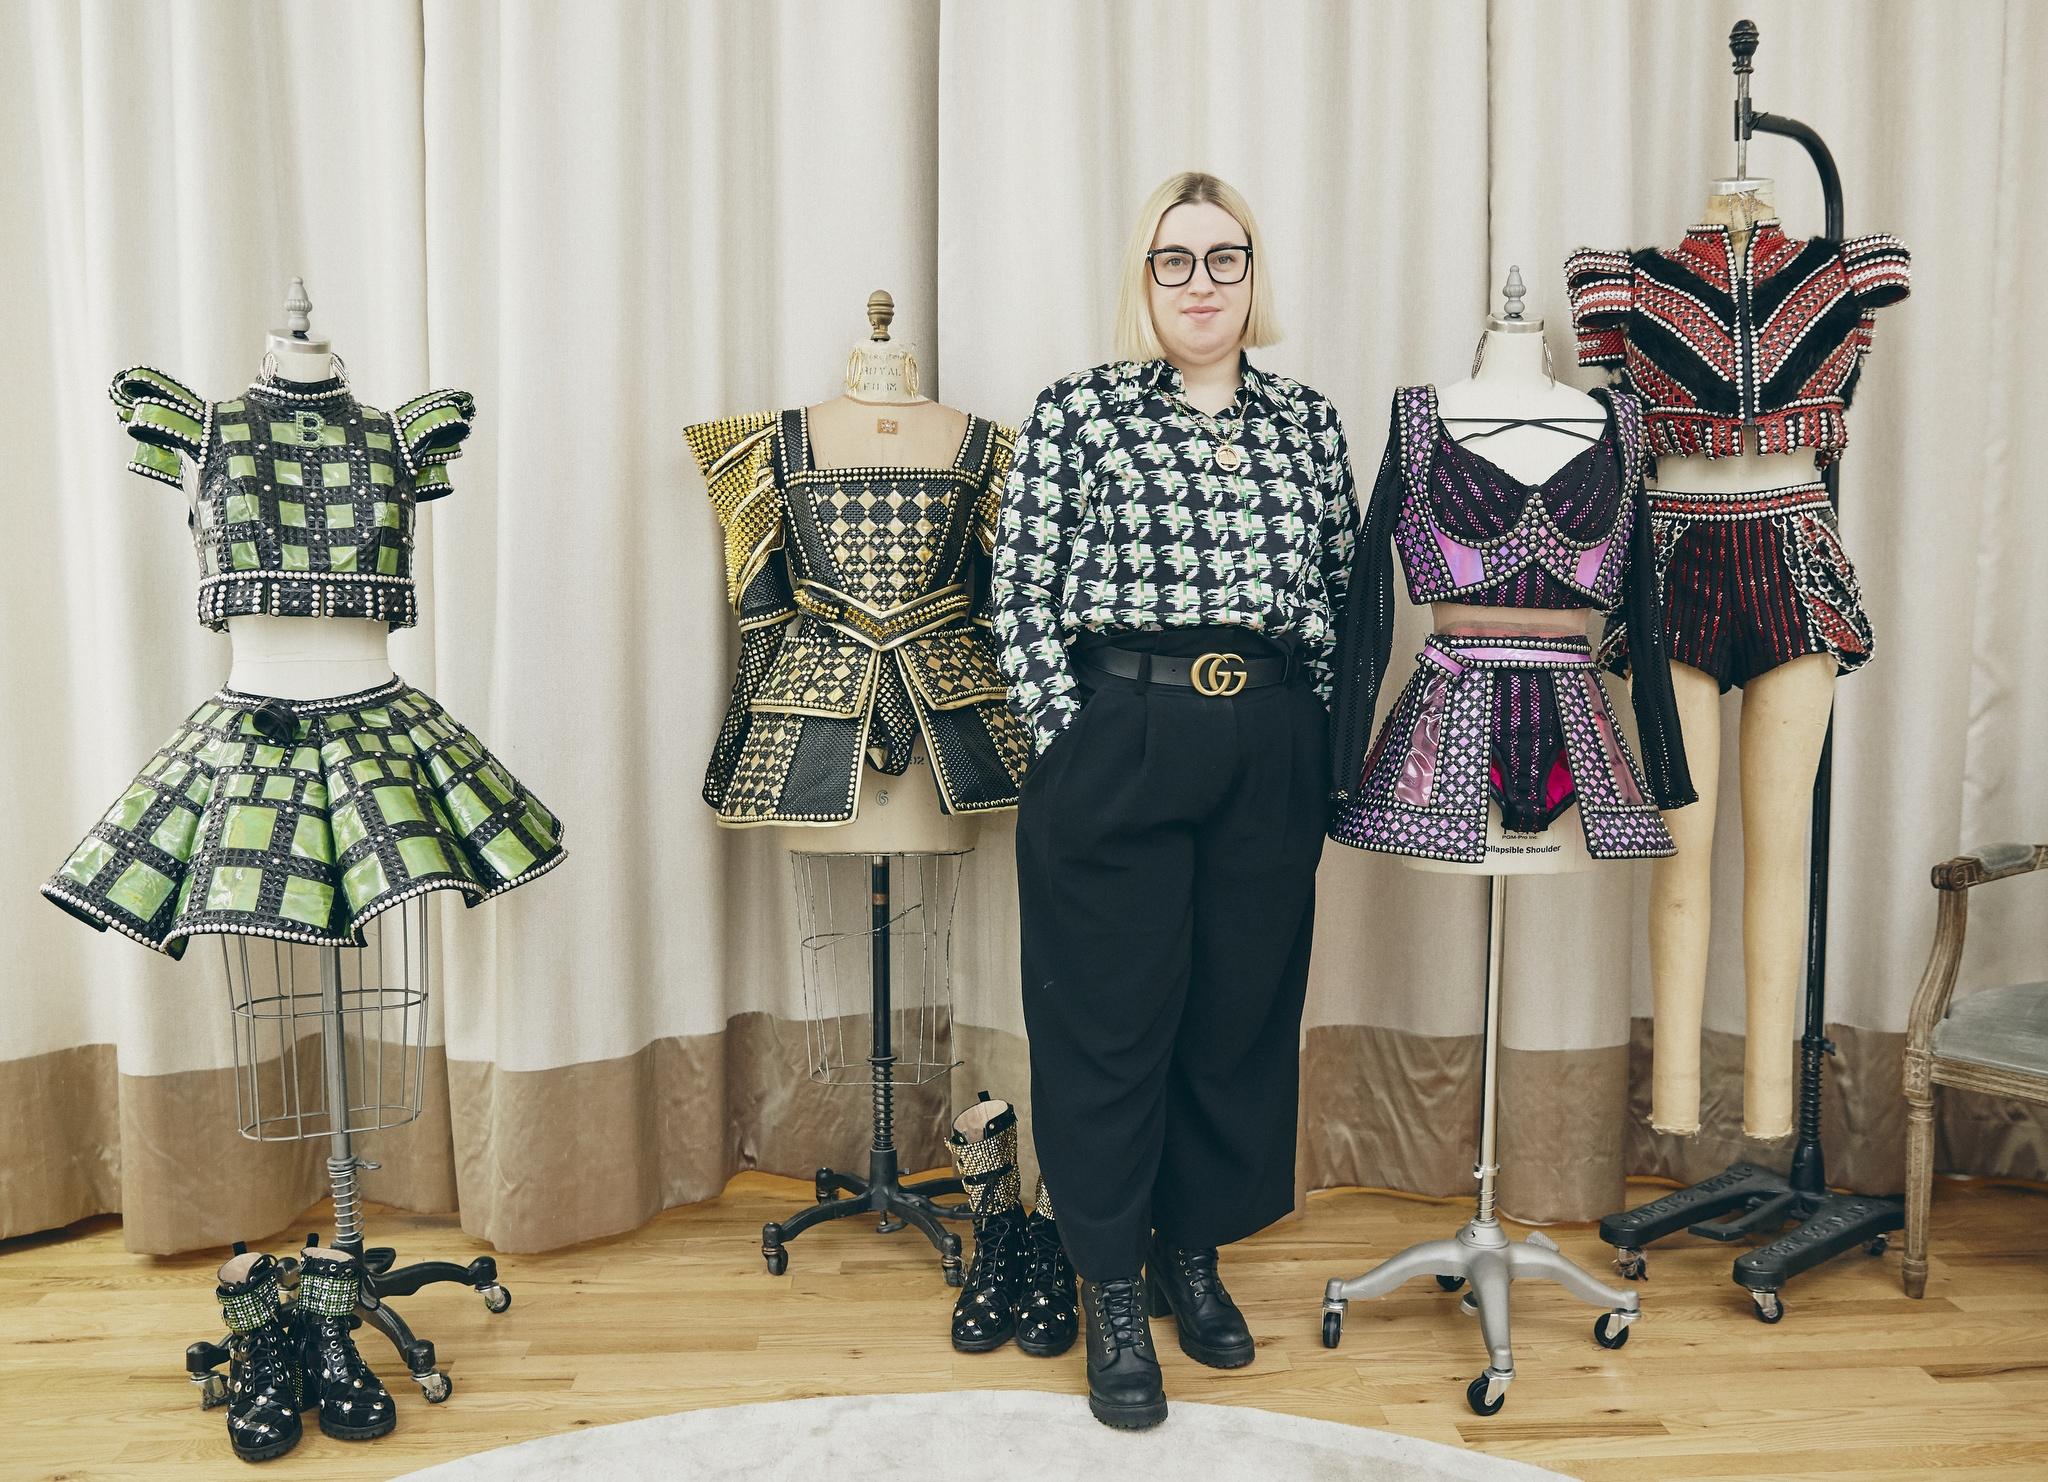 Six costume designer Gabriella Slade with her designs.